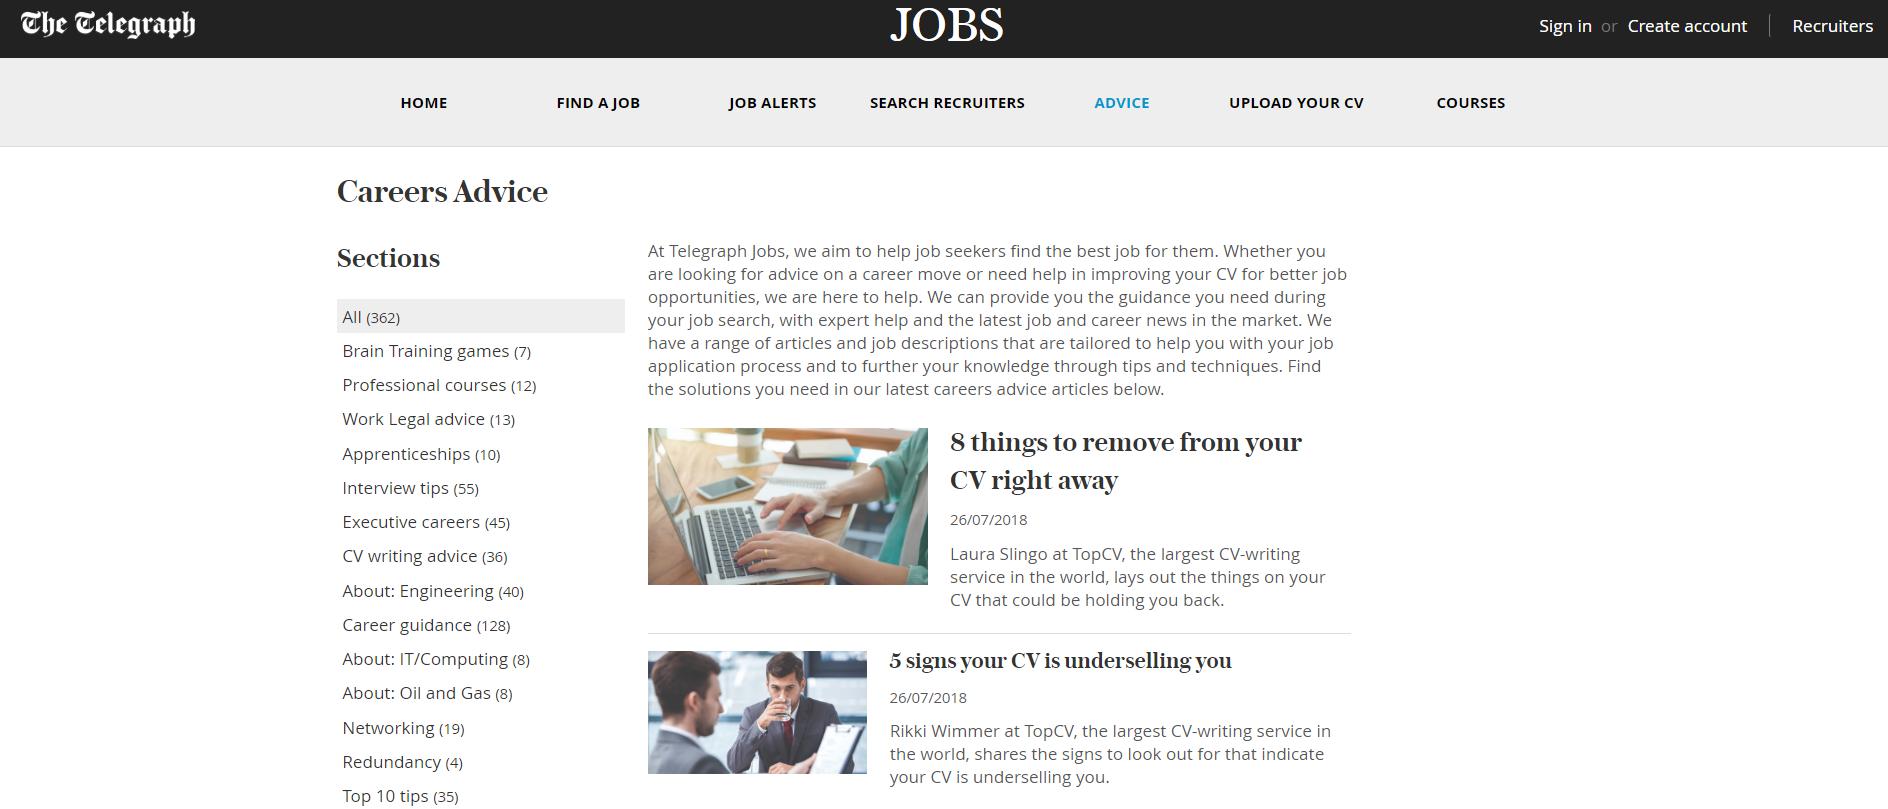 job search advice telegraph jobs